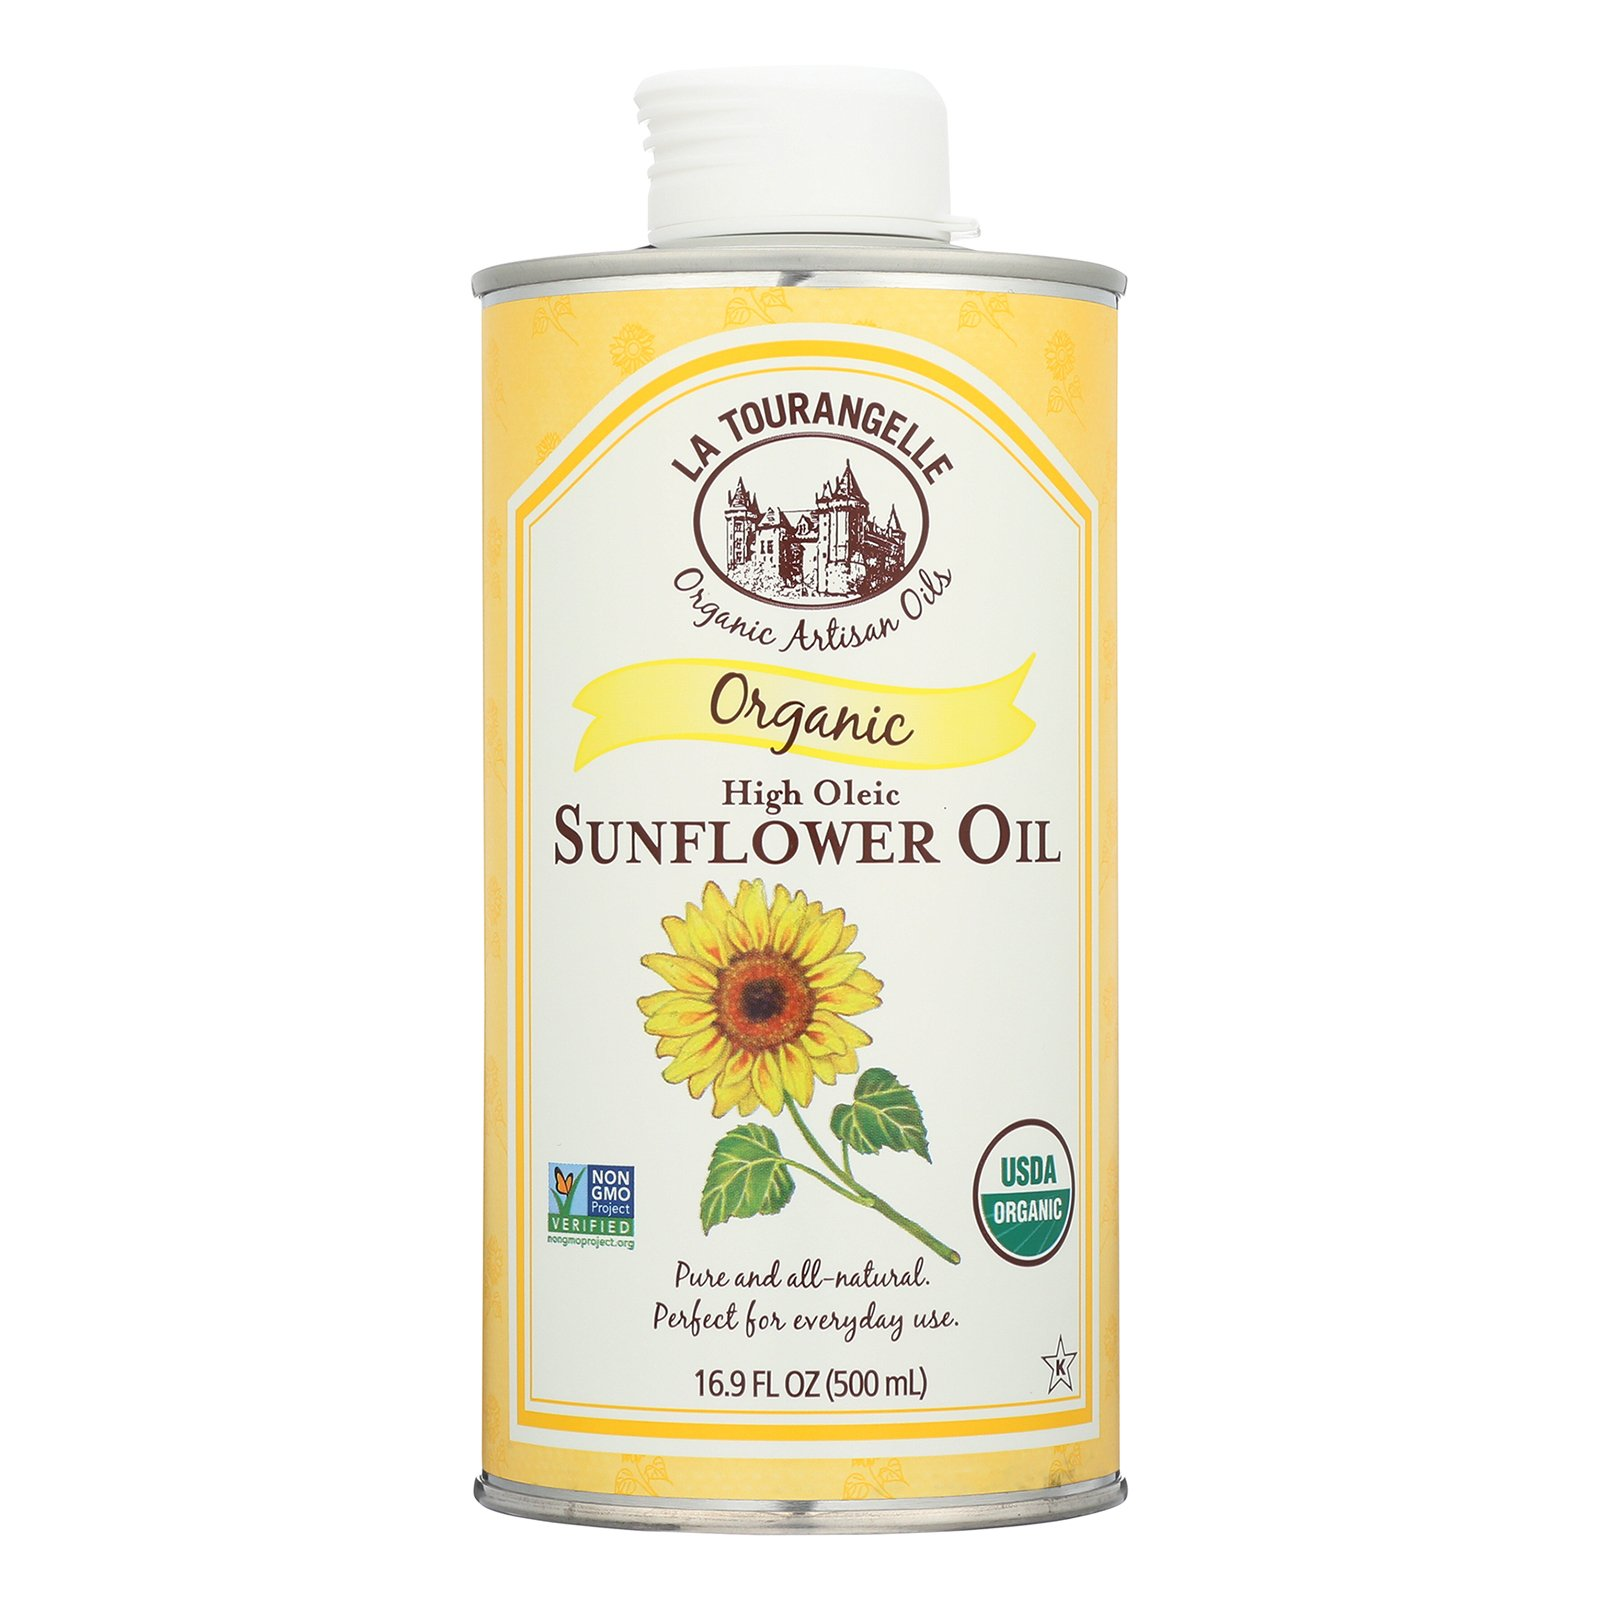 La Tourangelle Sunflower Oil - Case of 6 - 16.9 Fl oz.